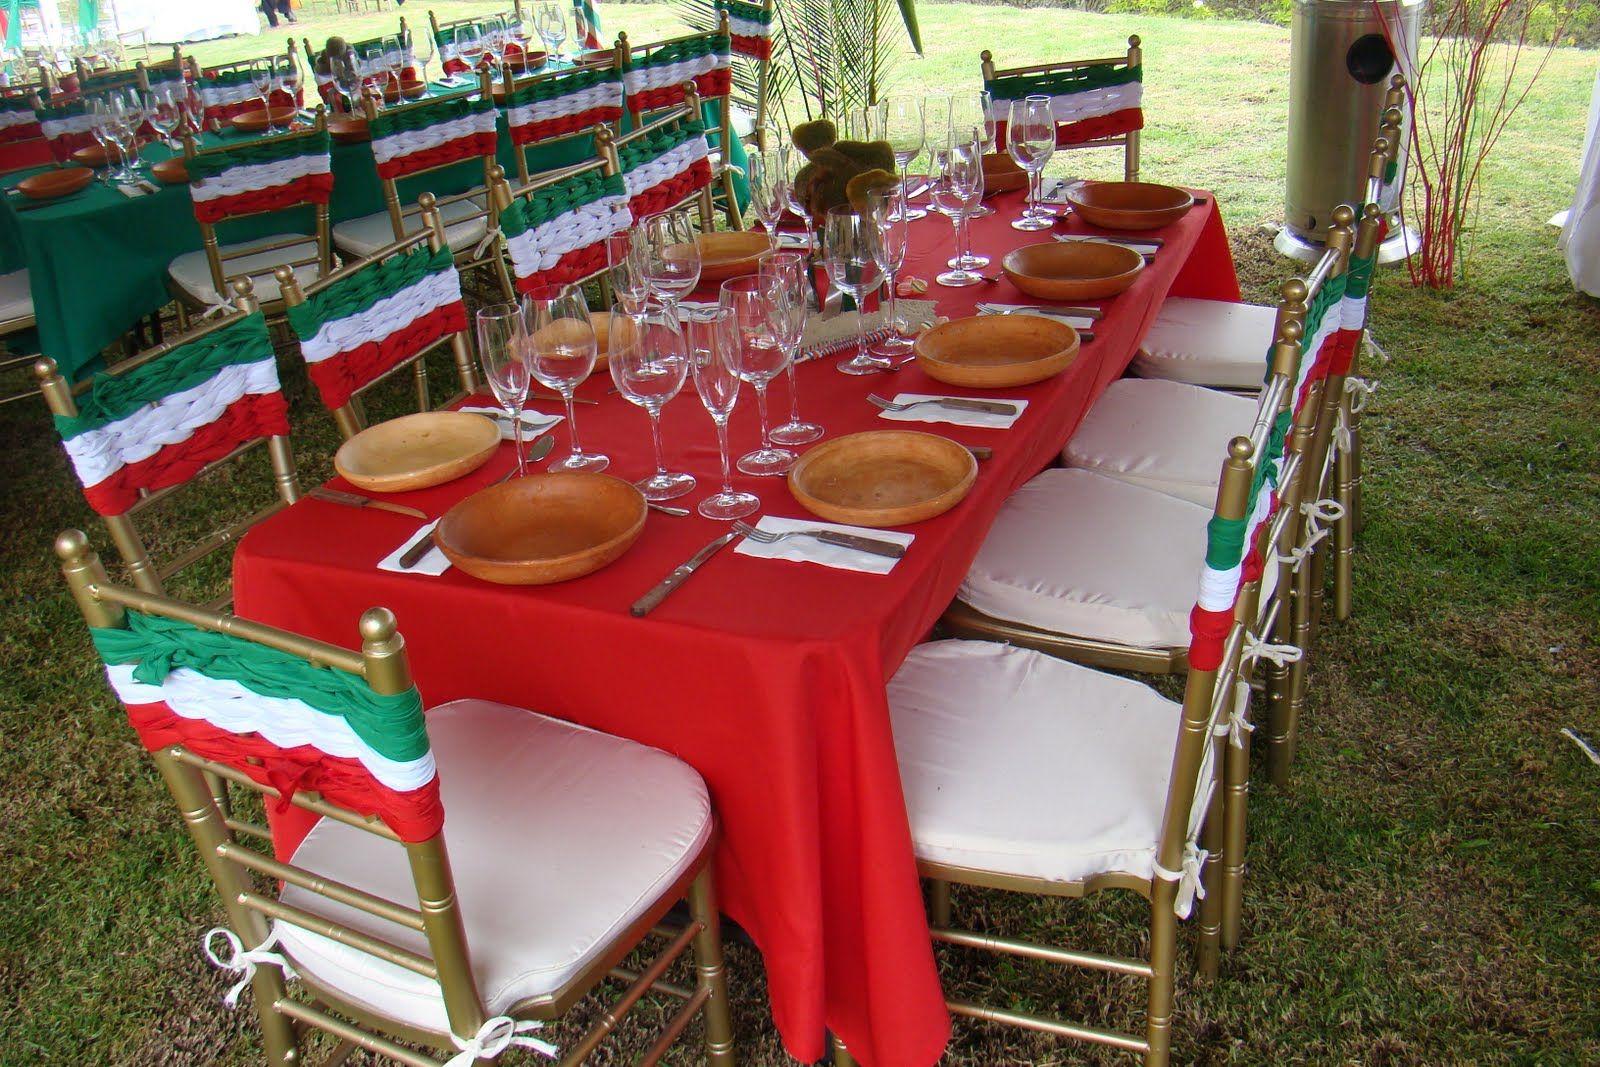 Beula decoraciones decoracion de eventos tematicos e for Decoracion mexicana